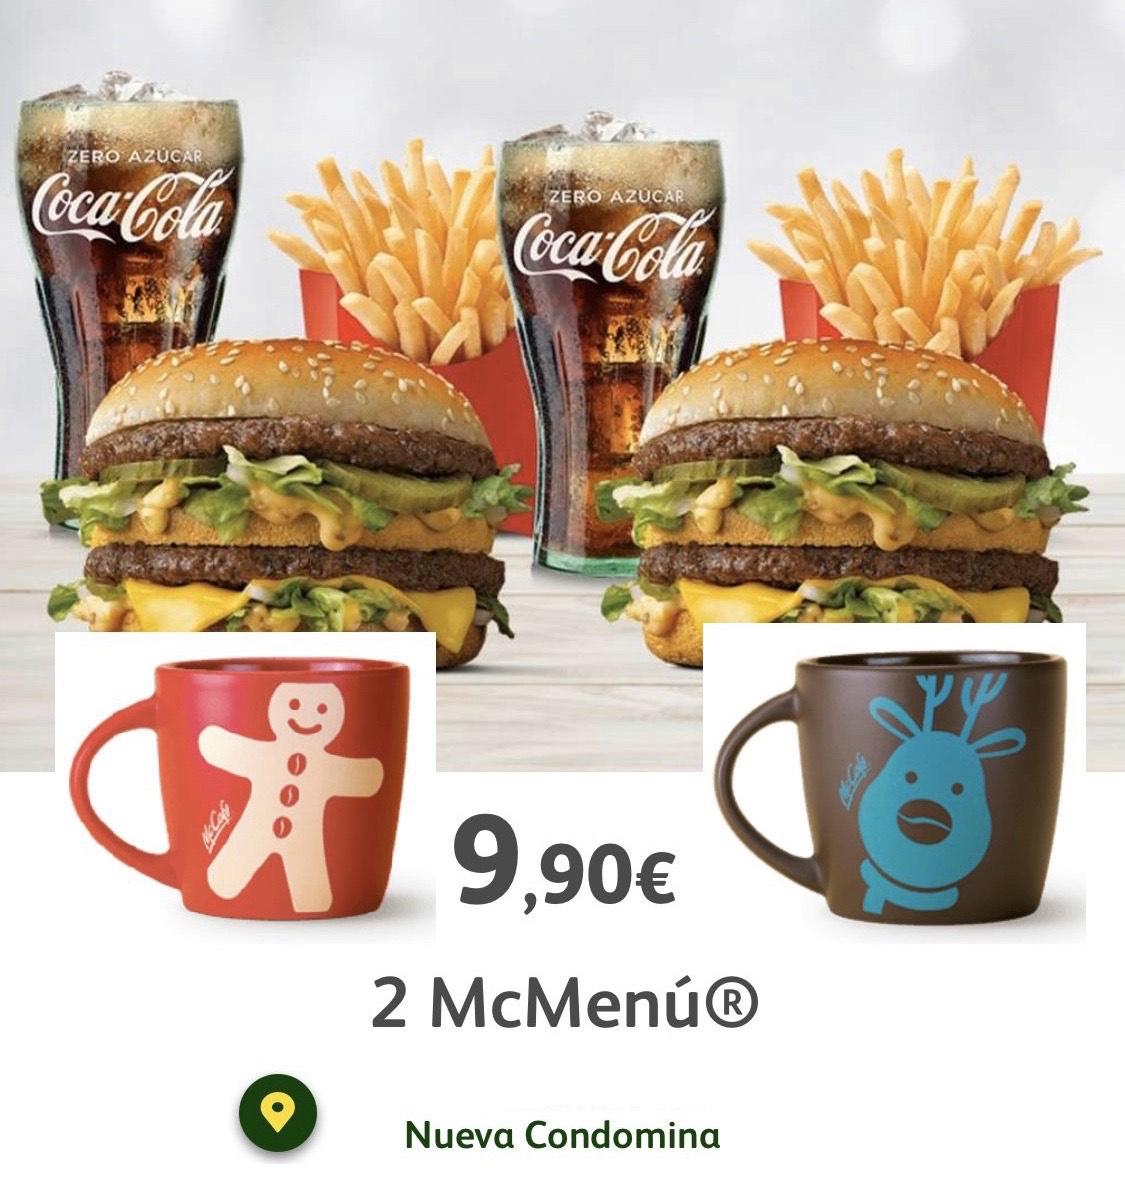 Ofertón 2 McMenú Grandes + 2 Tazas (Mcdonalds Nueva condomina, Murcia)